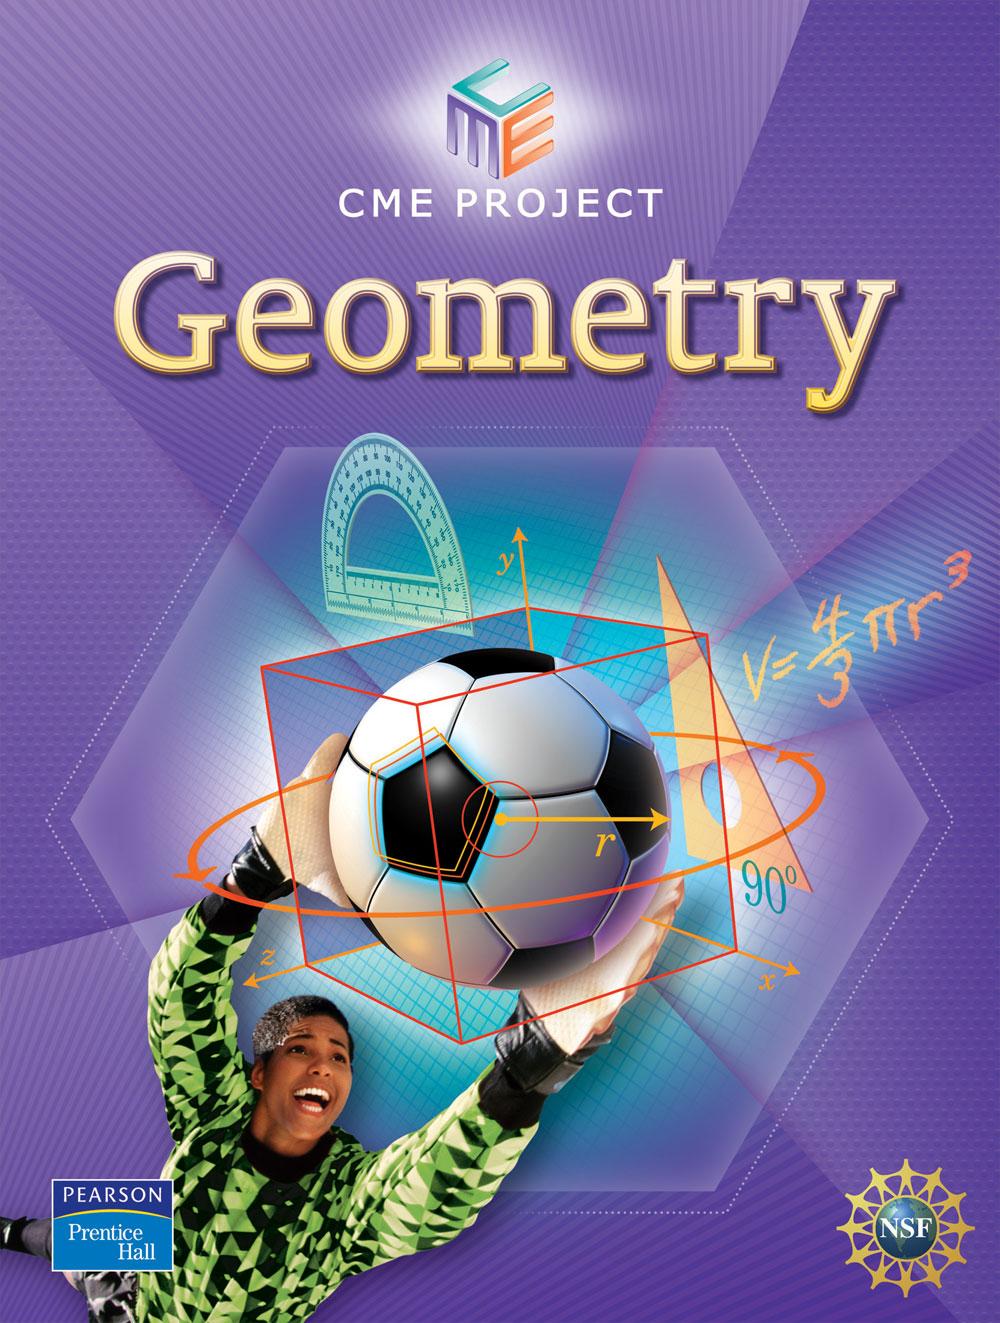 CME-Geom.jpg